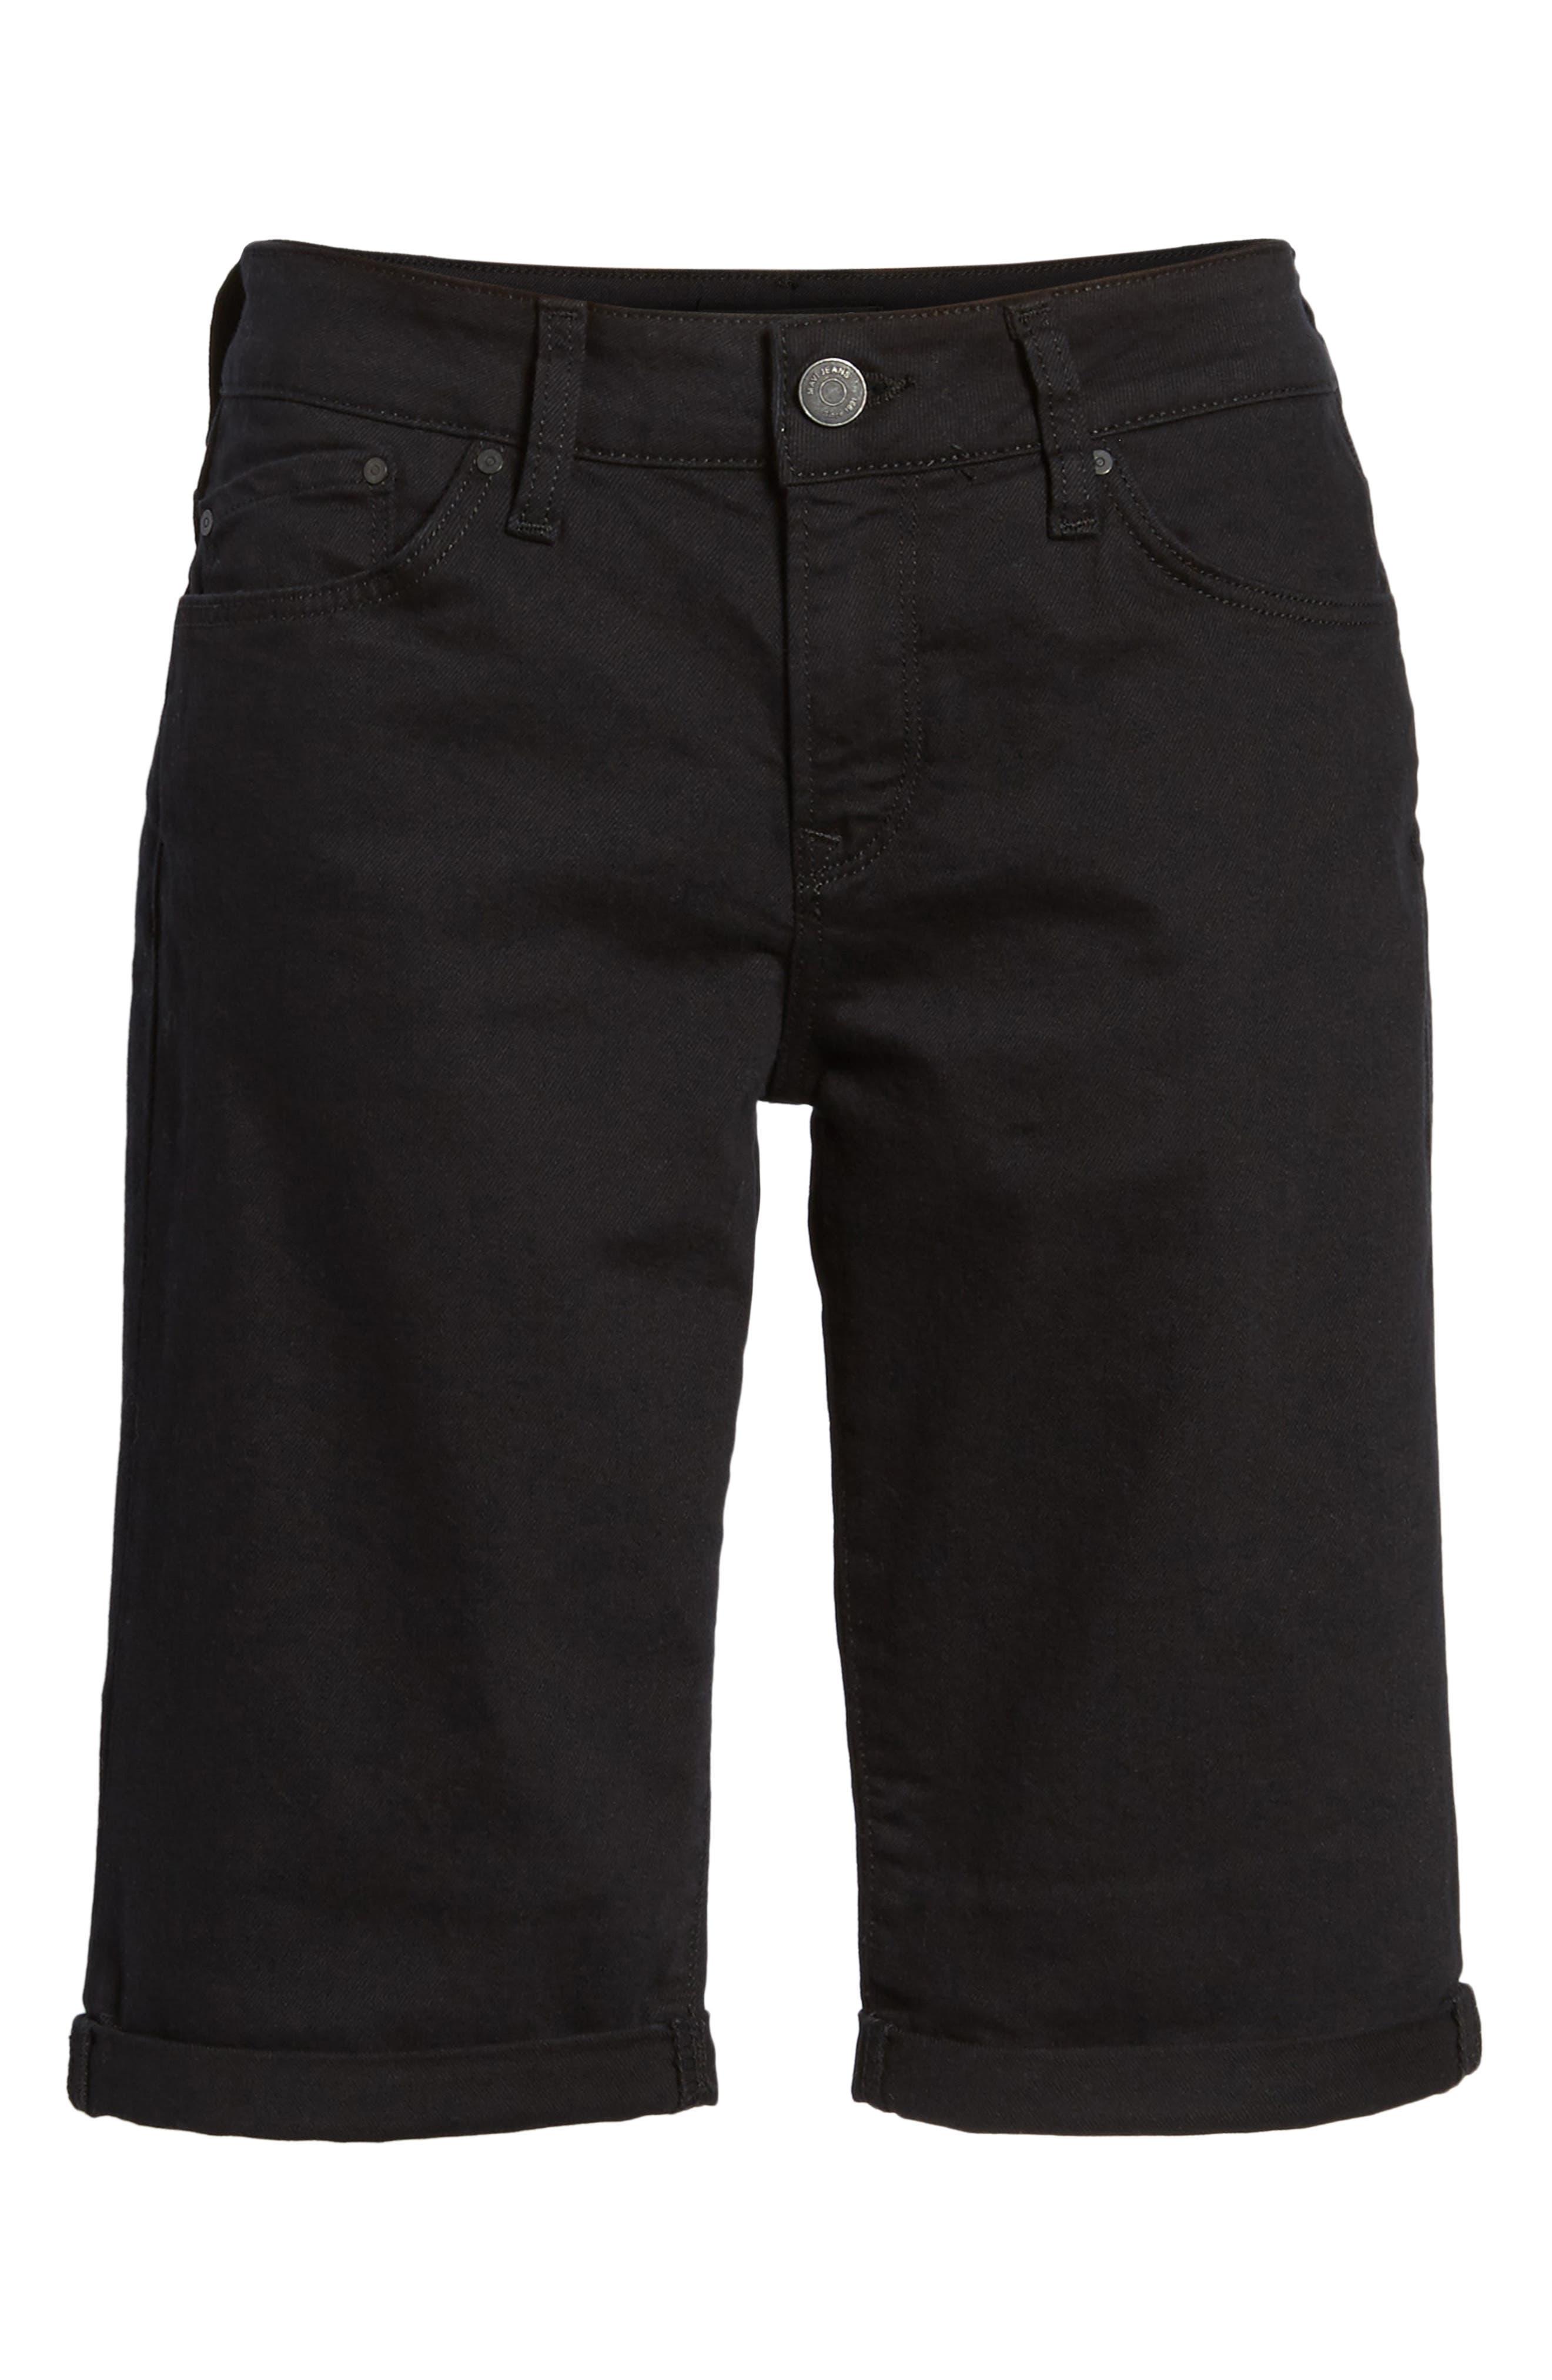 Karly Black Nolita Roll Cuff Bermuda Shorts,                             Alternate thumbnail 6, color,                             001